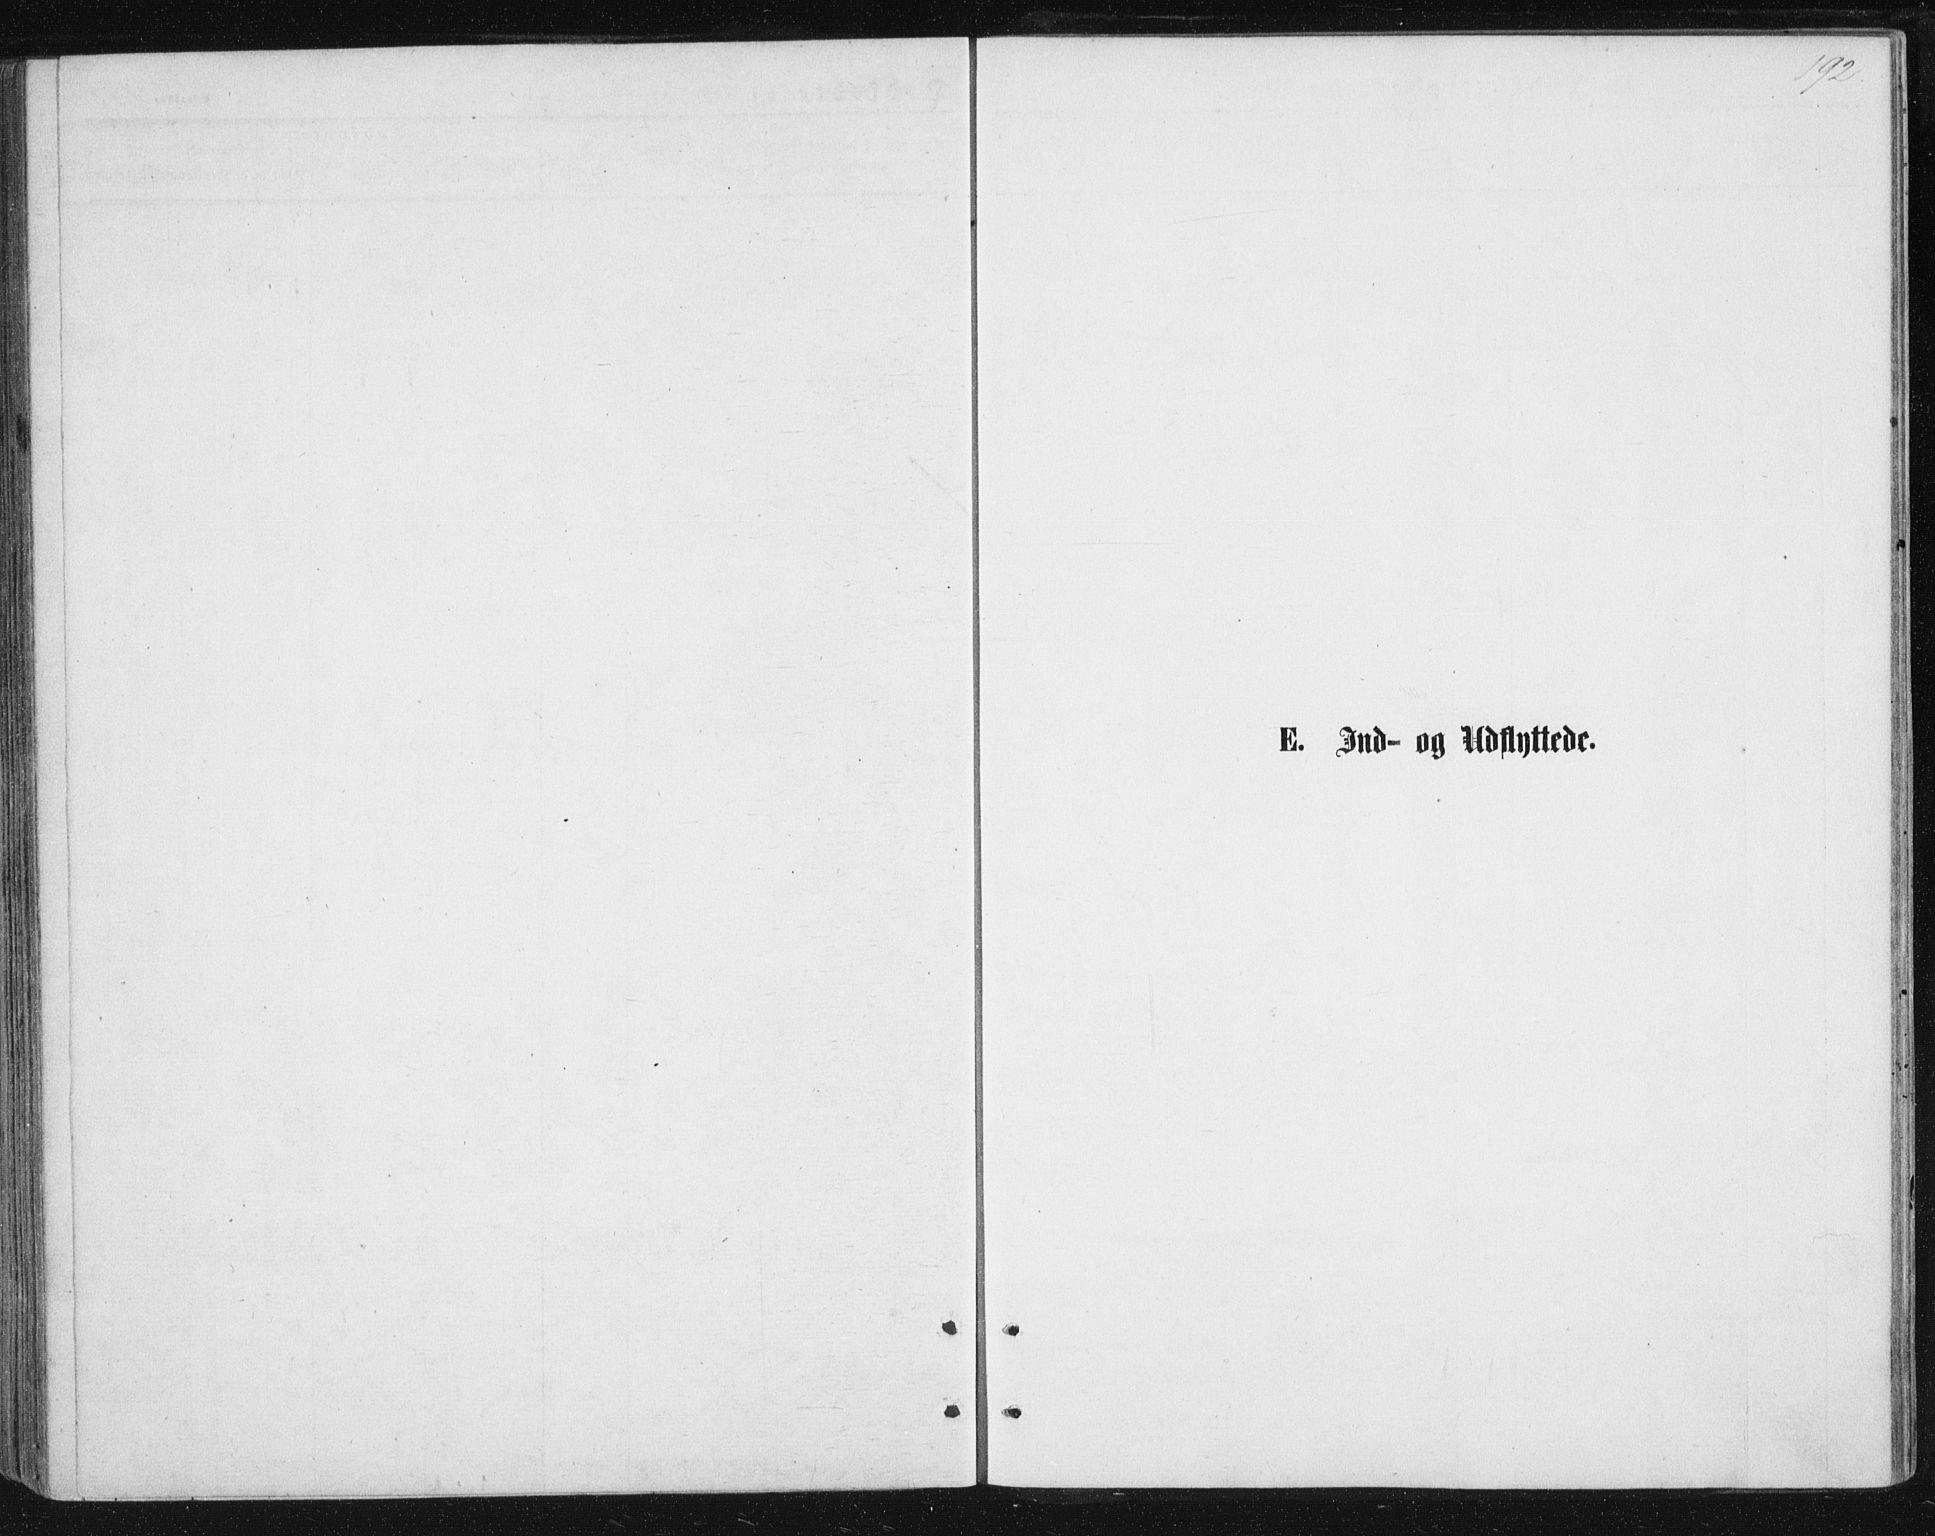 SAT, Ministerialprotokoller, klokkerbøker og fødselsregistre - Nordland, 888/L1243: Ministerialbok nr. 888A09, 1876-1879, s. 192